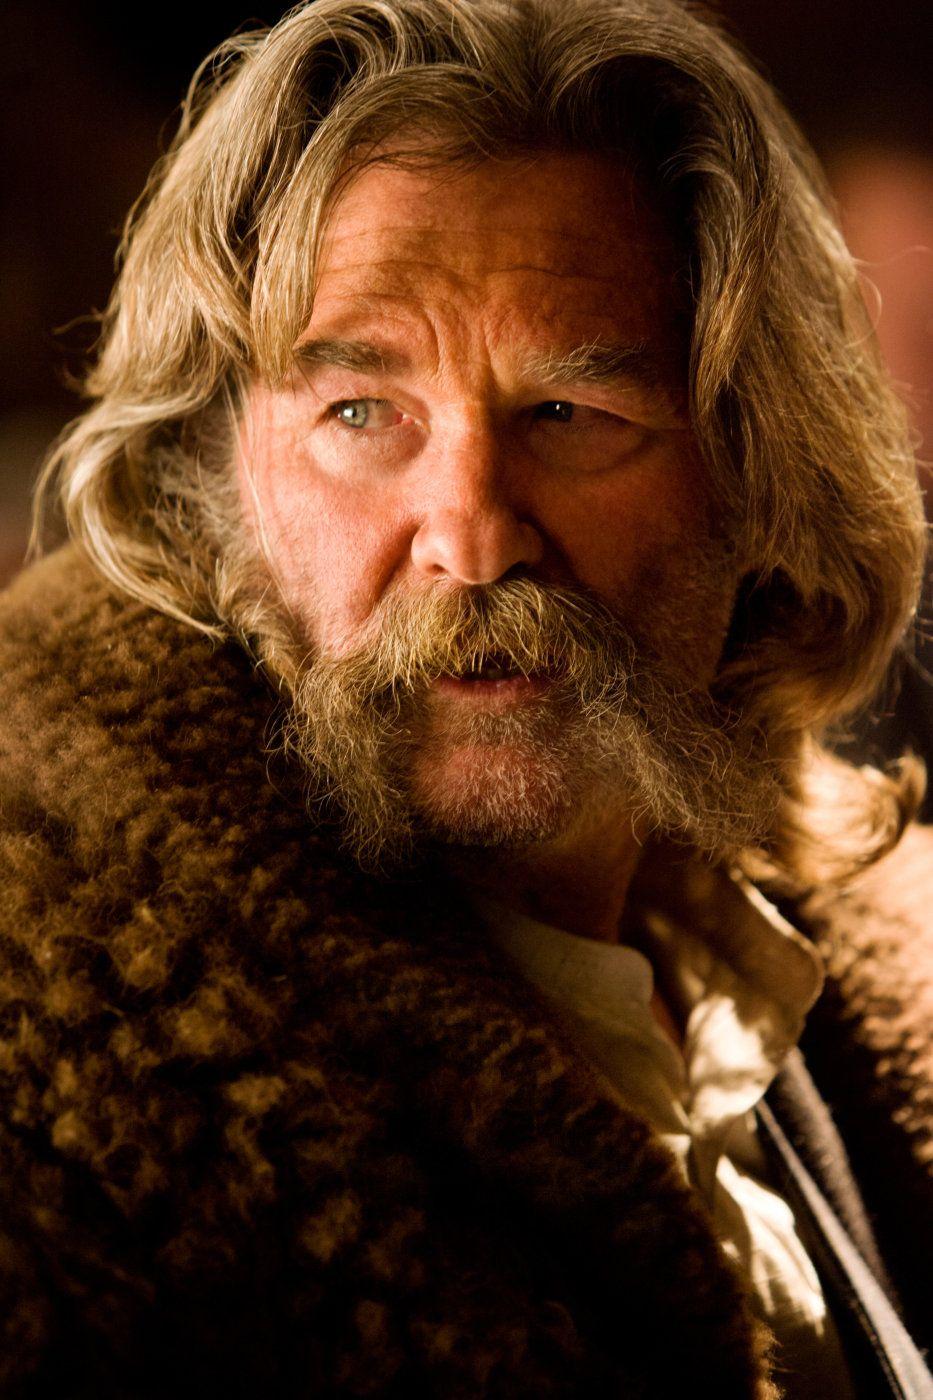 Kurt Russell in The Hateful Eight